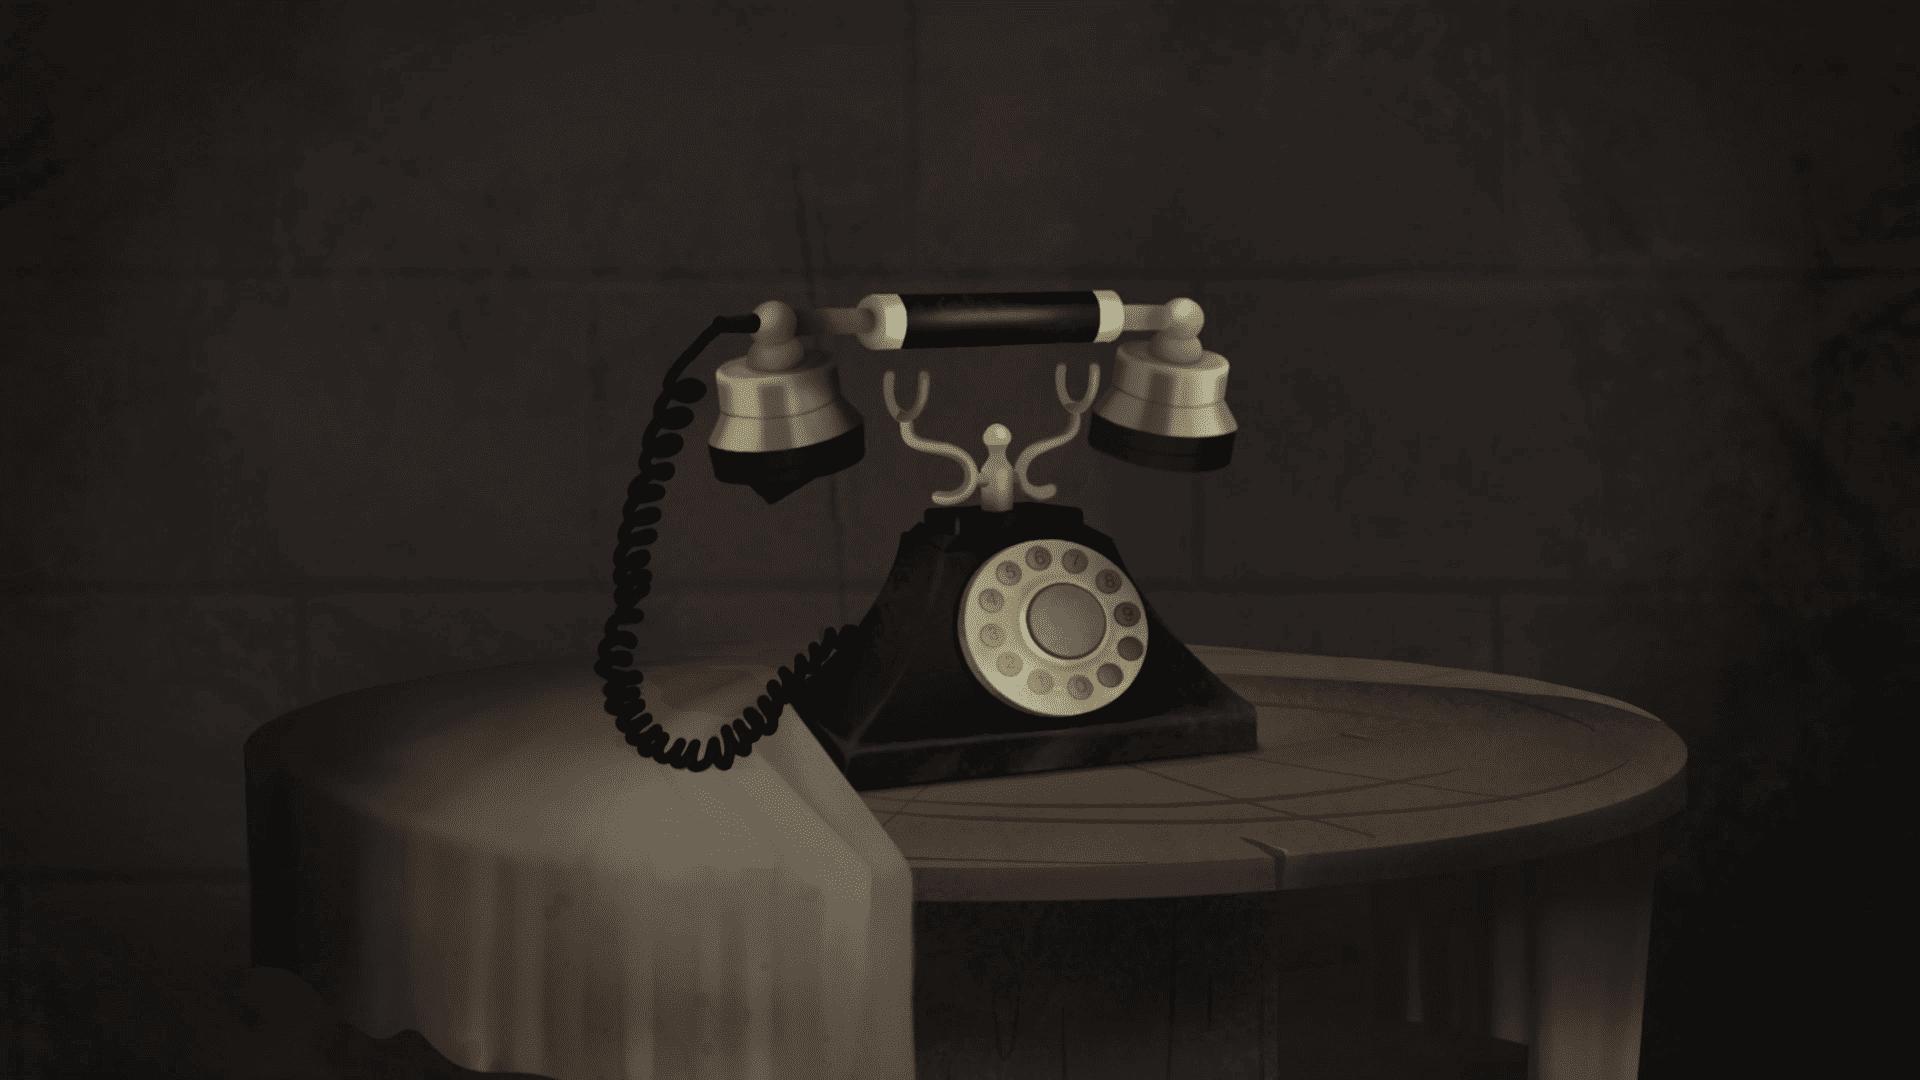 Landline phone - 2D Animation